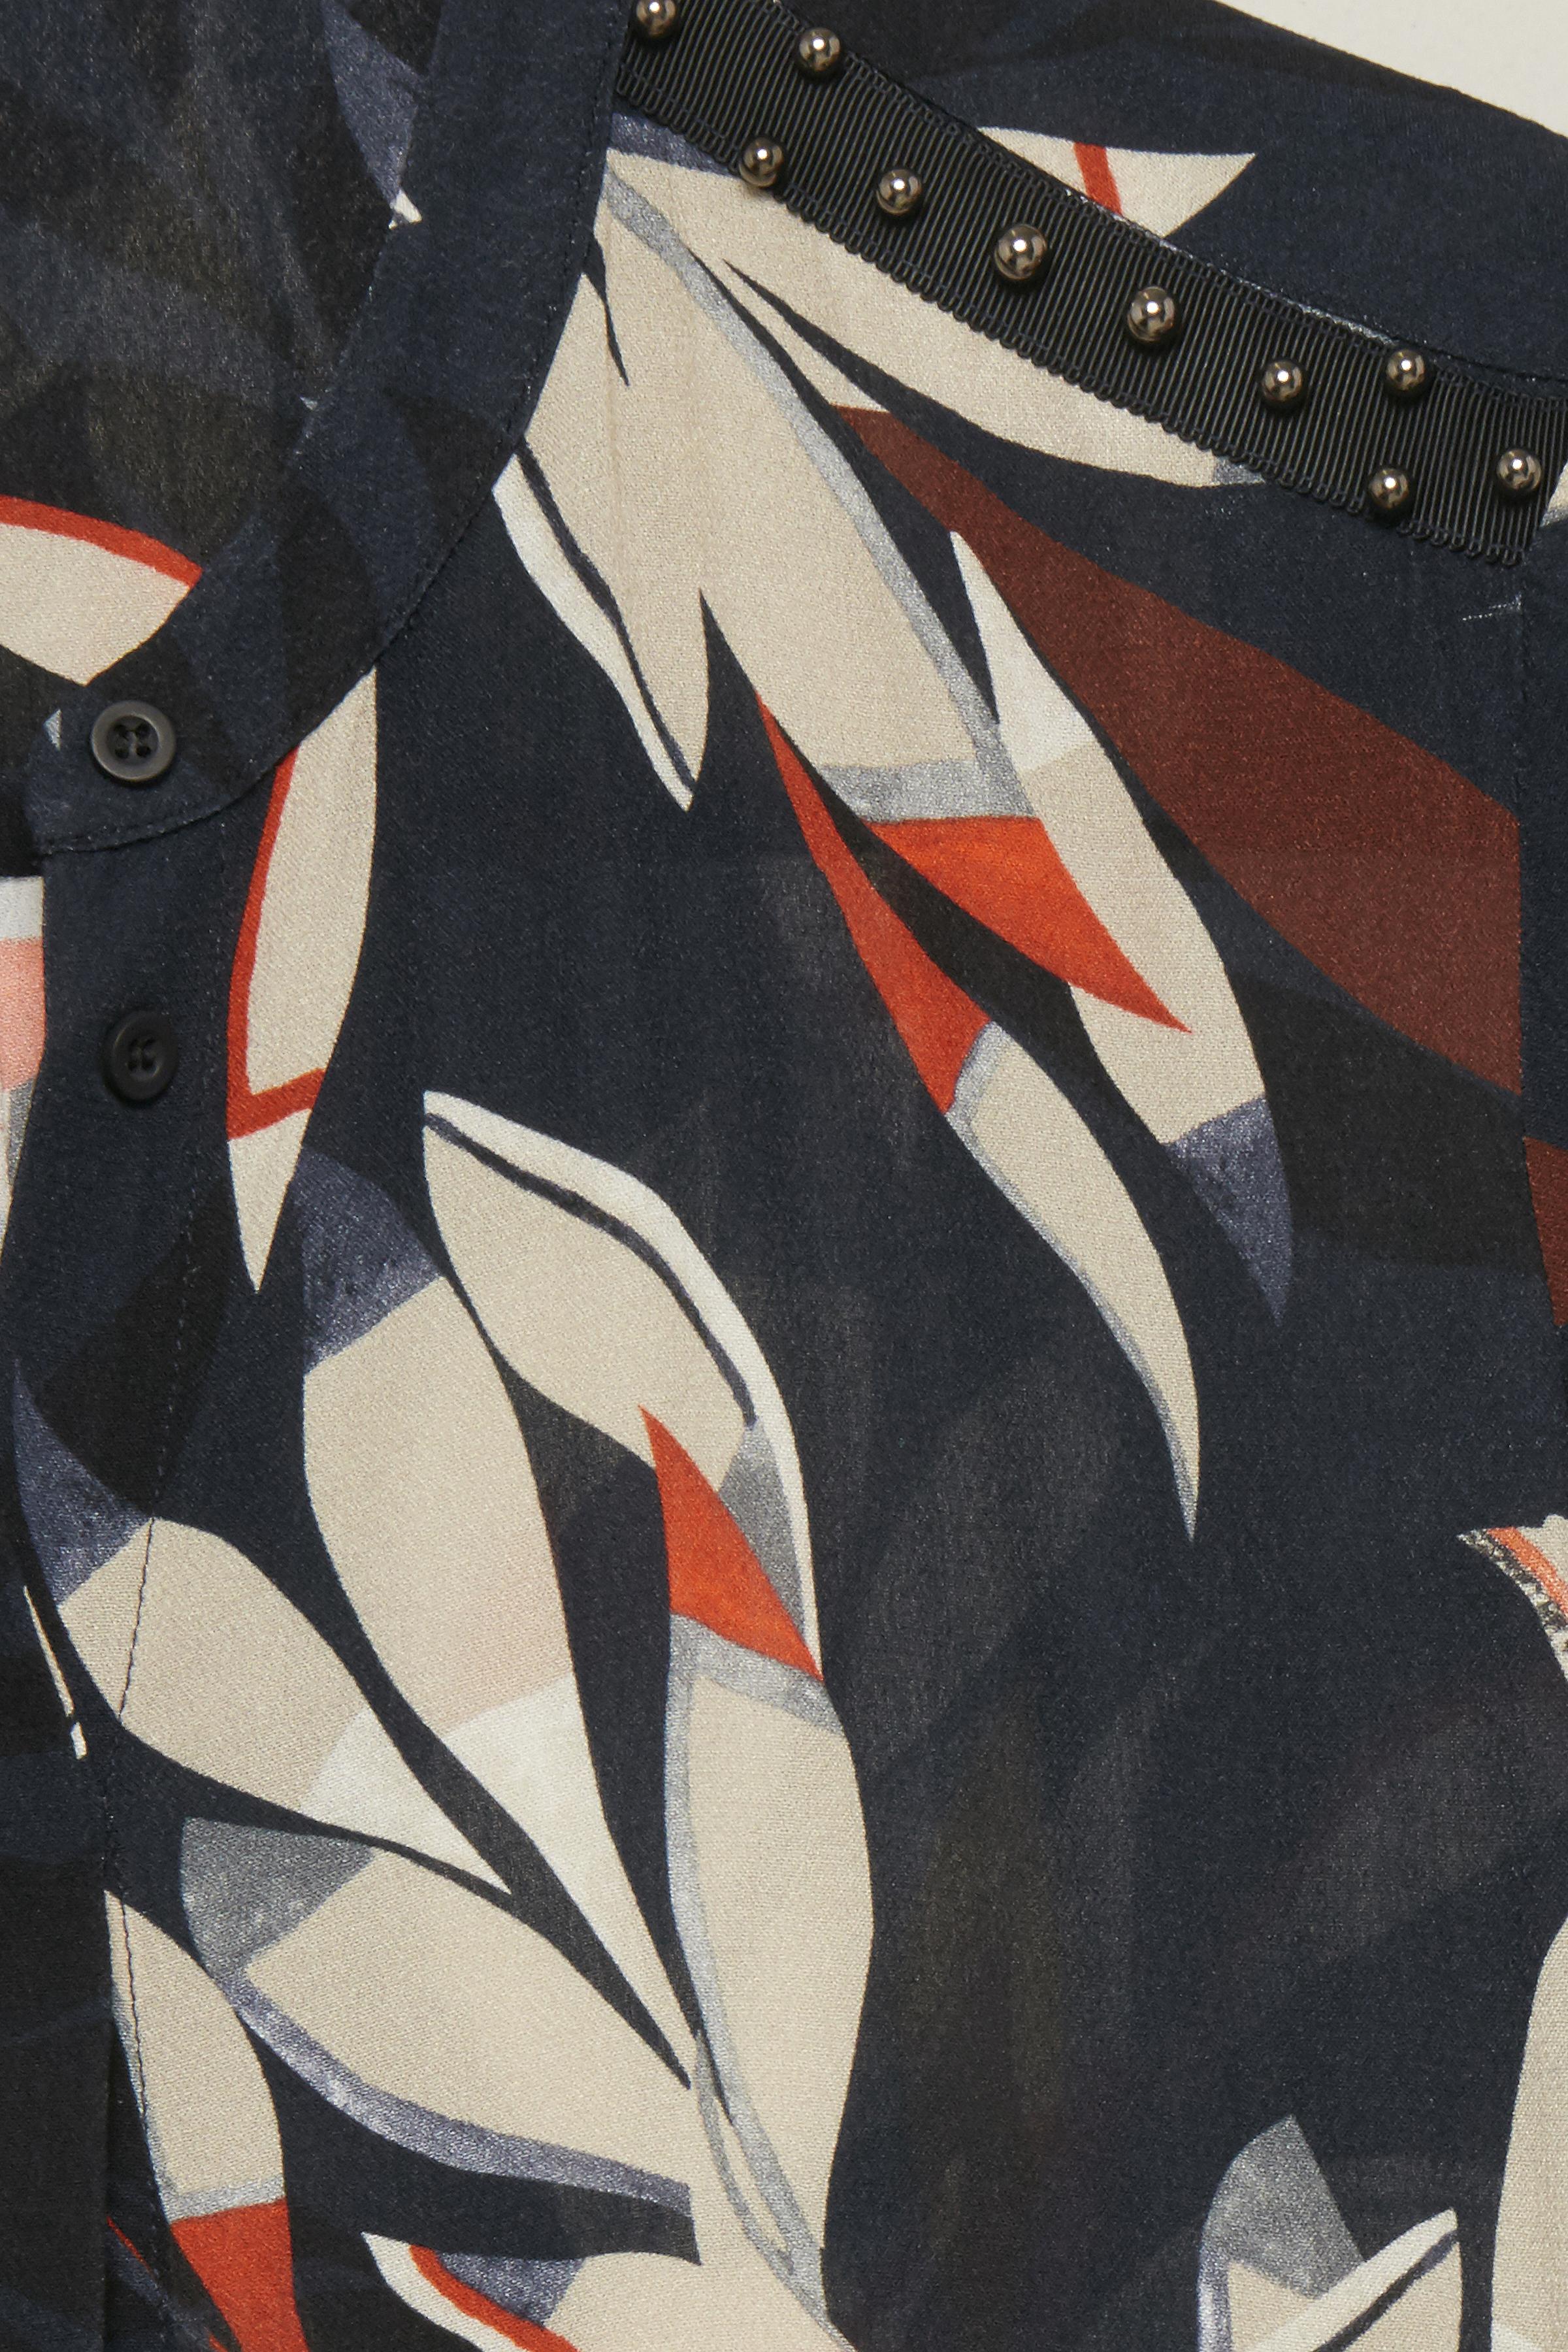 Marineblau/wollweiß Langarm-Bluse von Pulz Jeans – Shoppen Sie Marineblau/wollweiß Langarm-Bluse ab Gr. XS-XXL hier